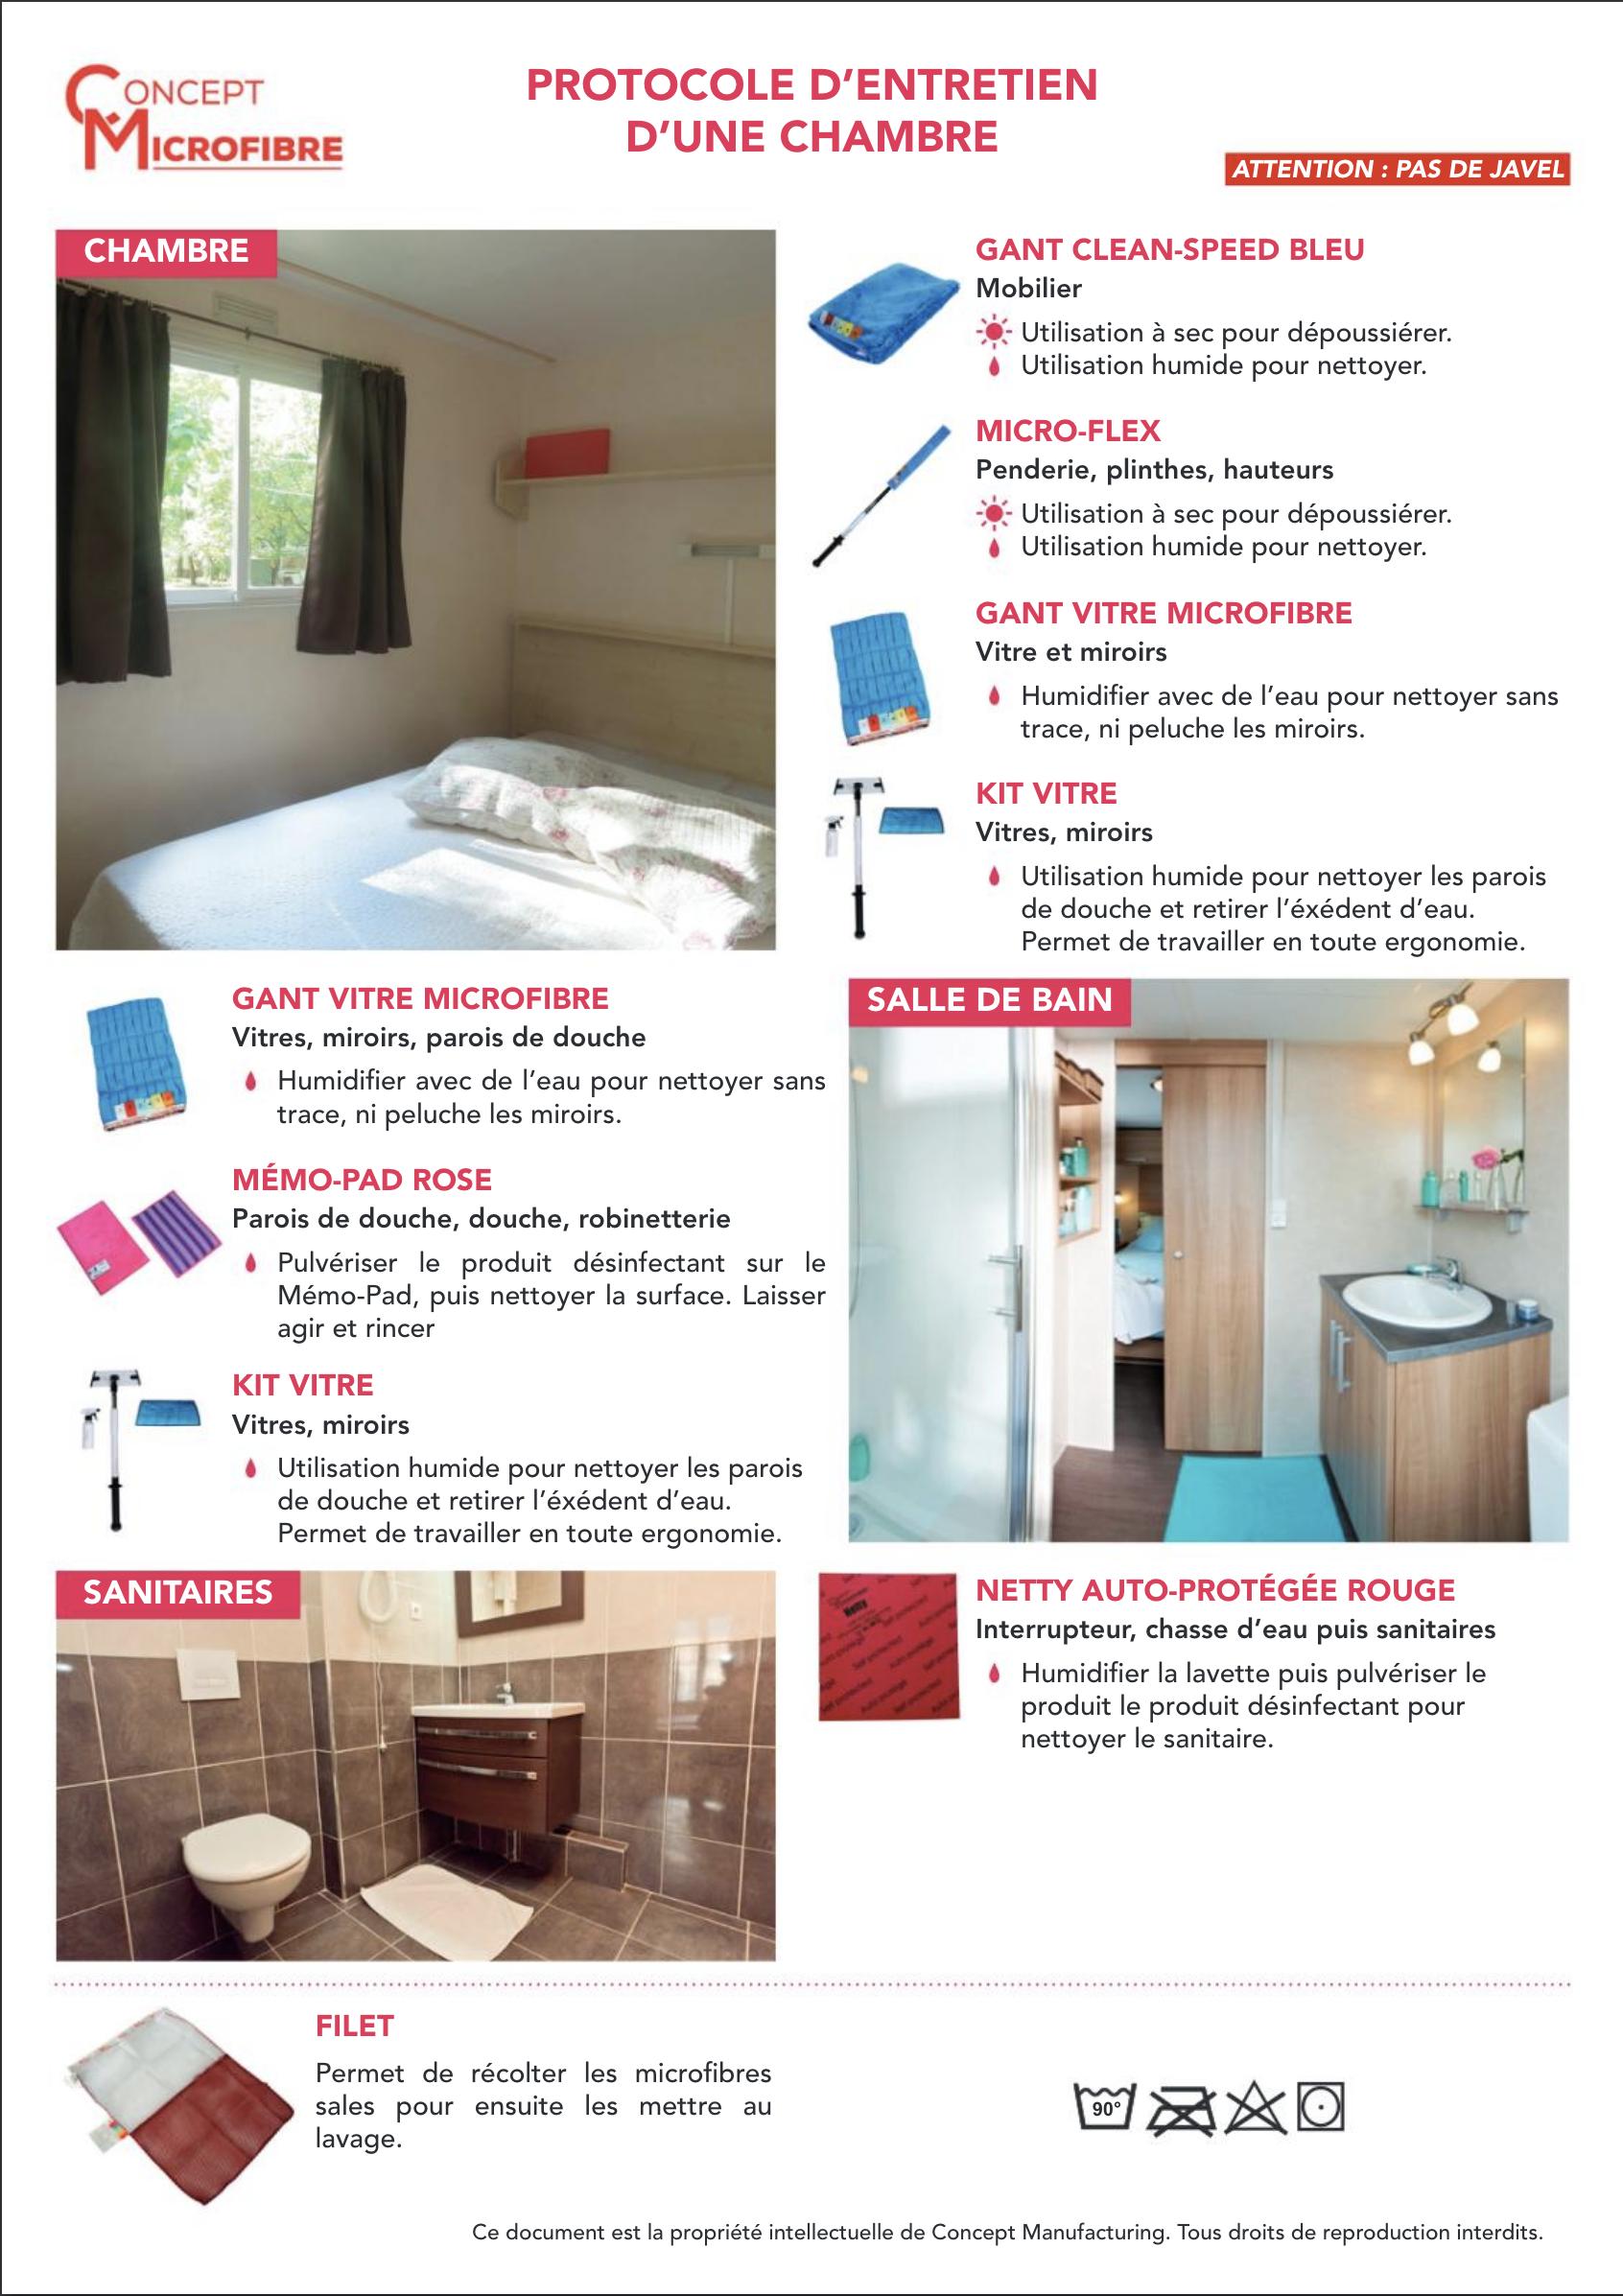 protocole-nettoyage-des-chambres